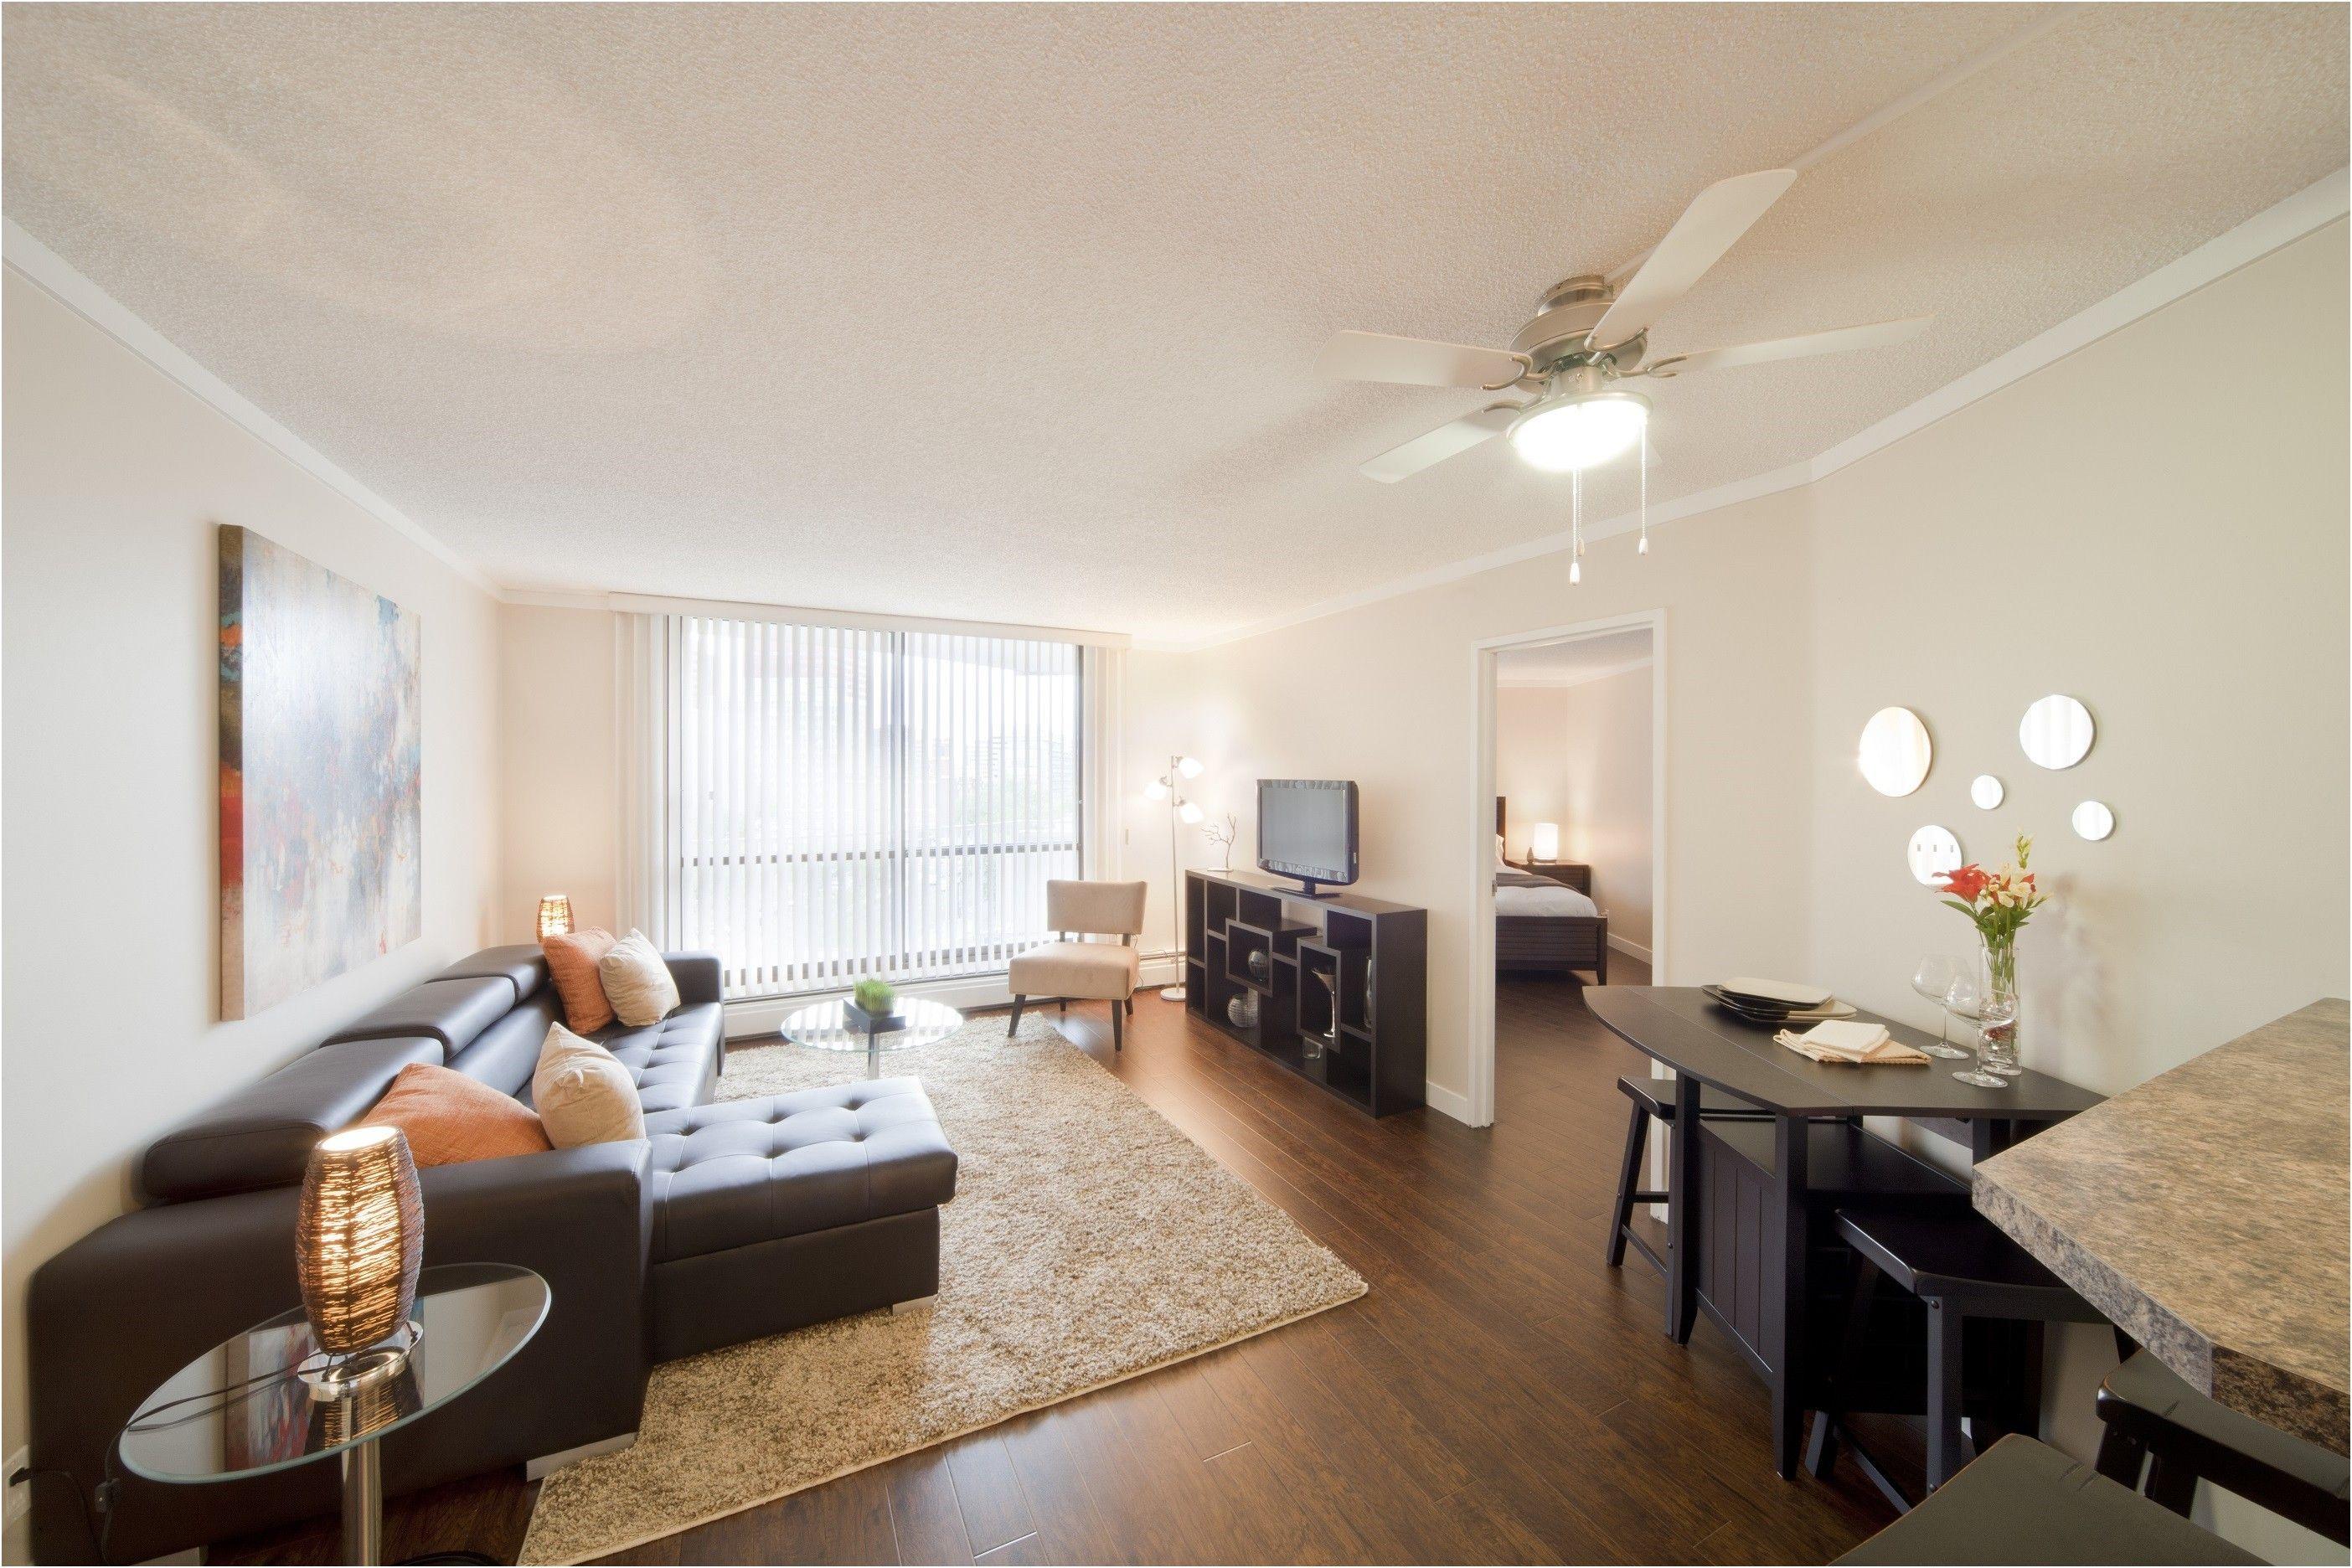 Superior Edmonton Downtown One Bedroom Apartment For Rent From Kijiji Edmonton  Basement For Rent